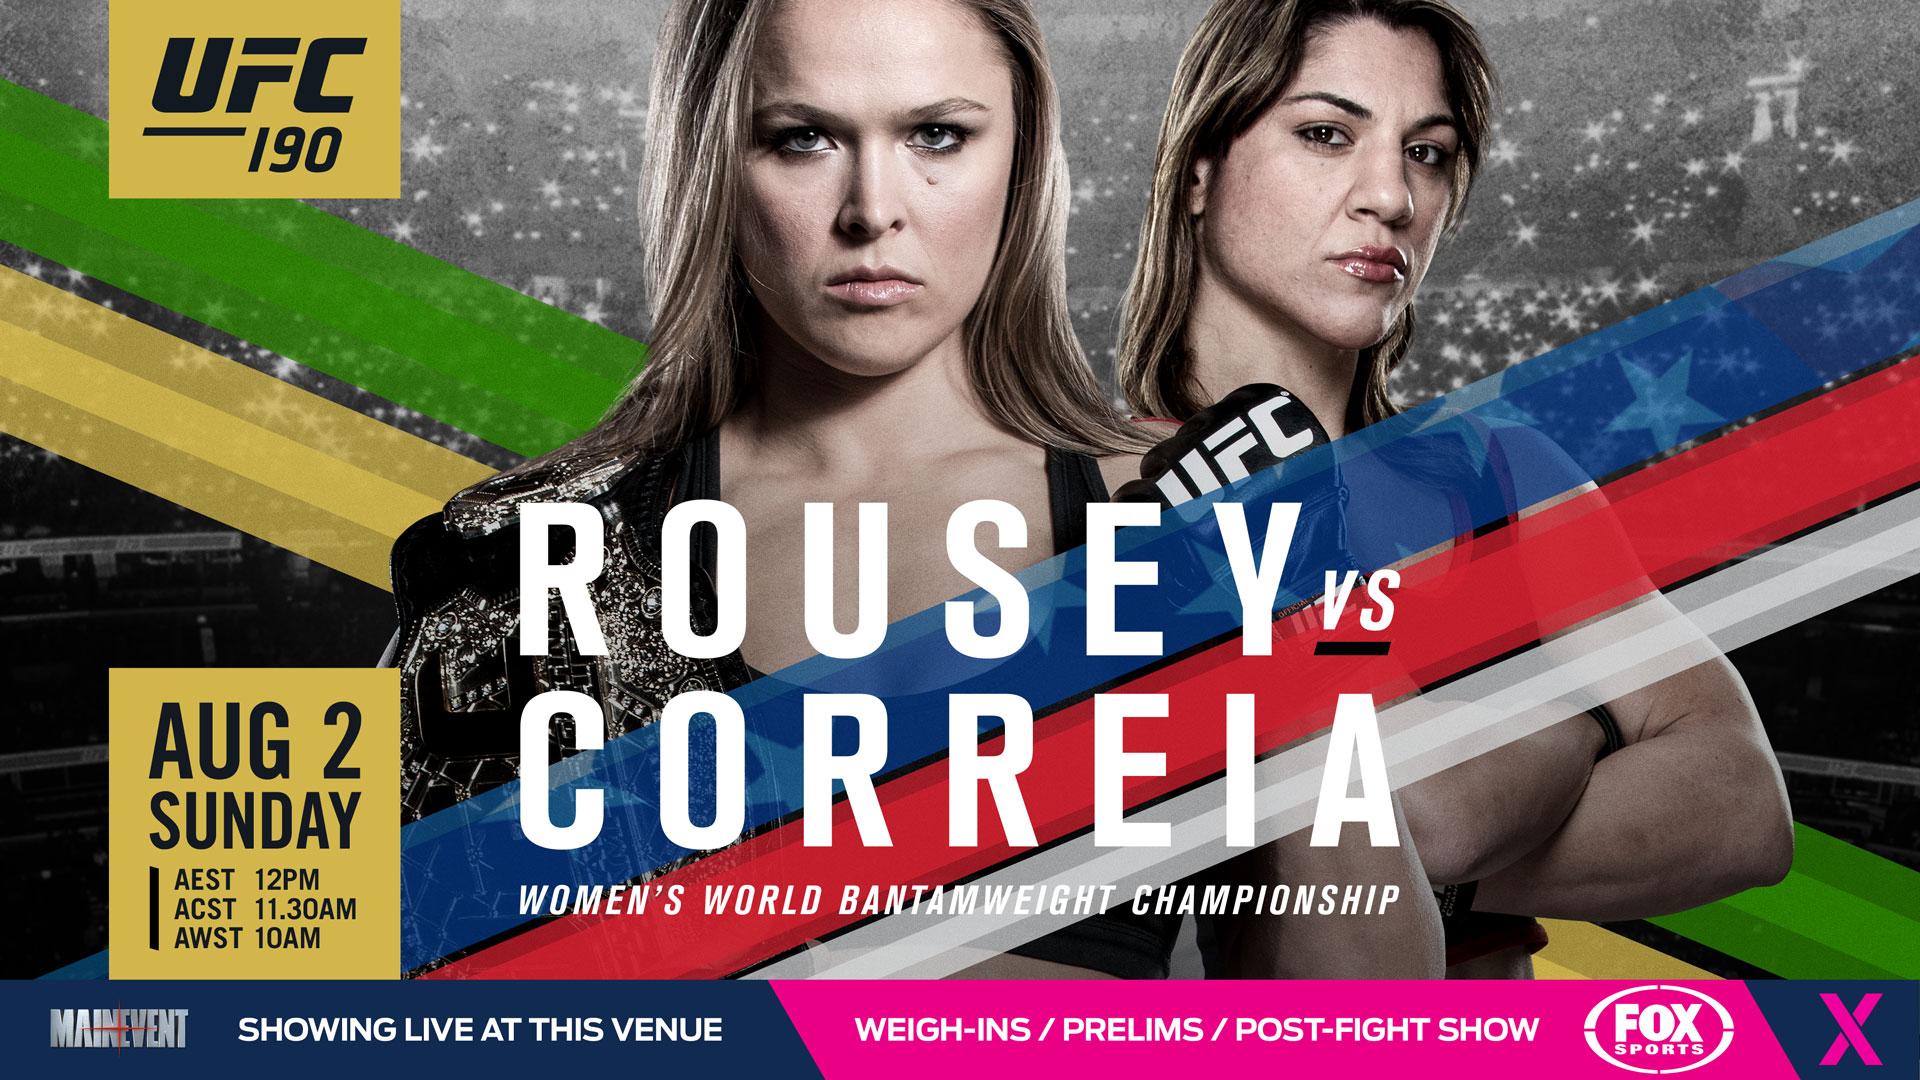 UFC190-FOXSPORTS-16x9.jpg